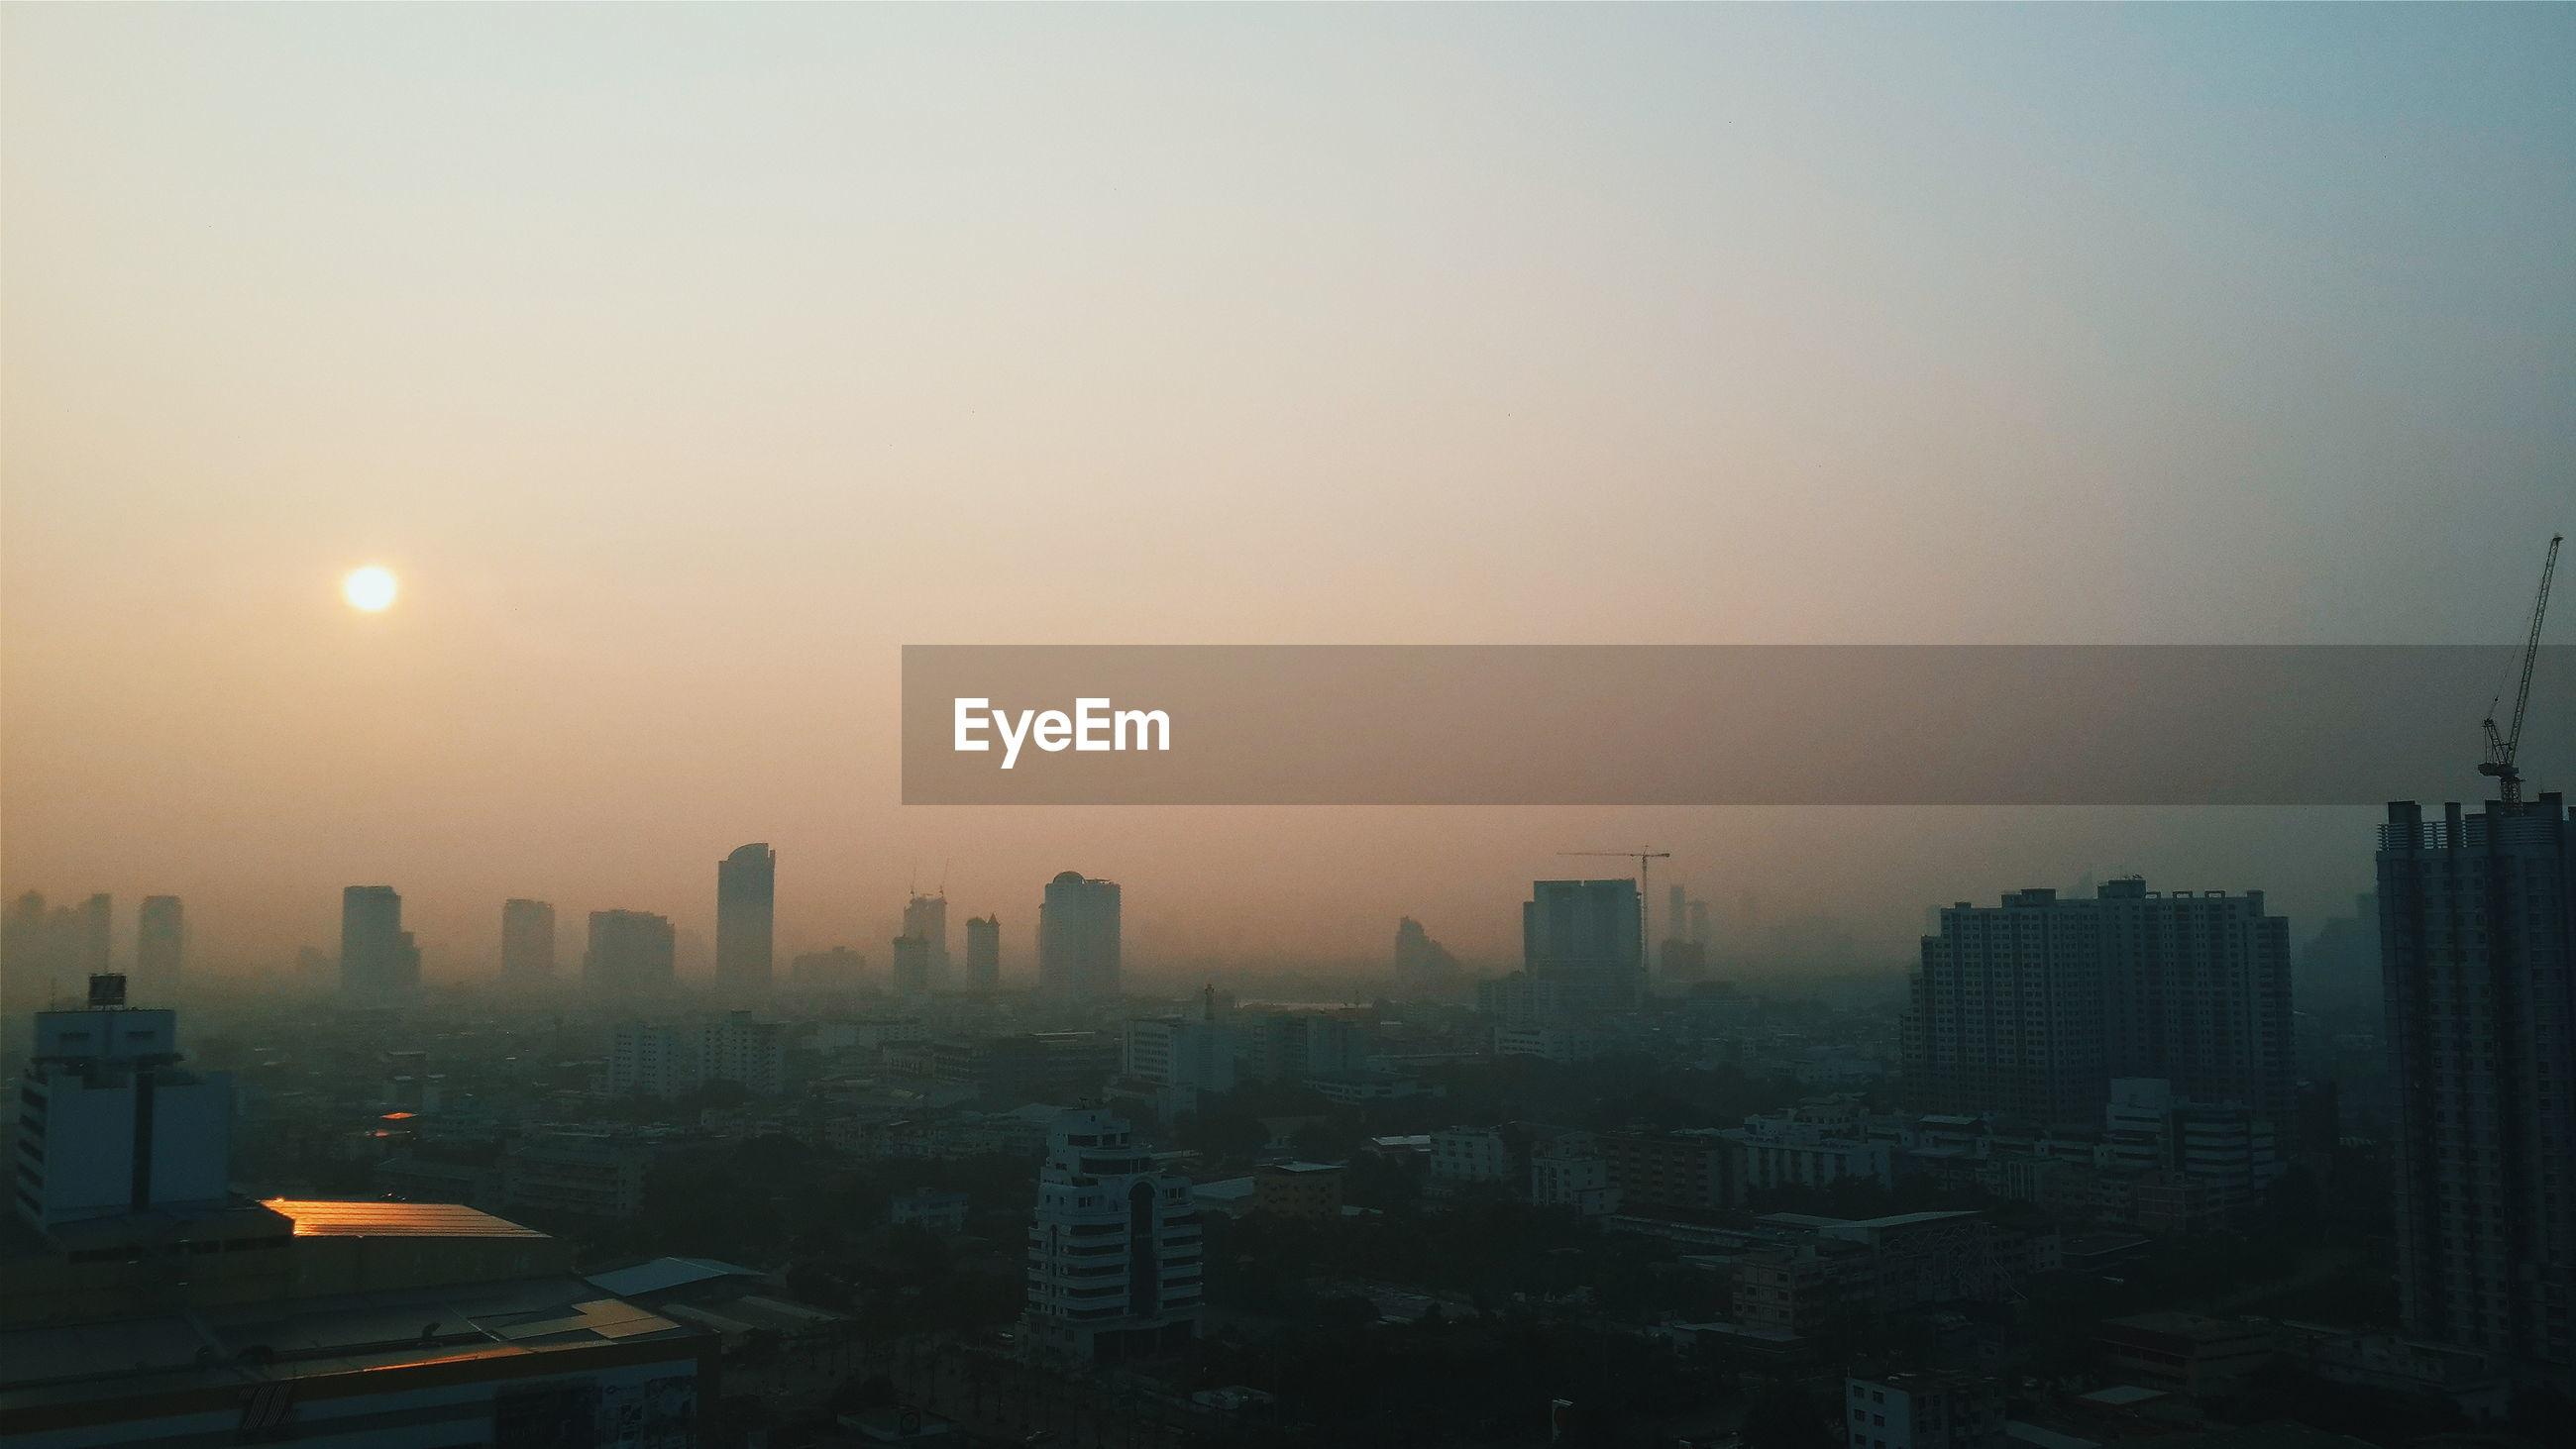 MODERN CITY AT SUNSET